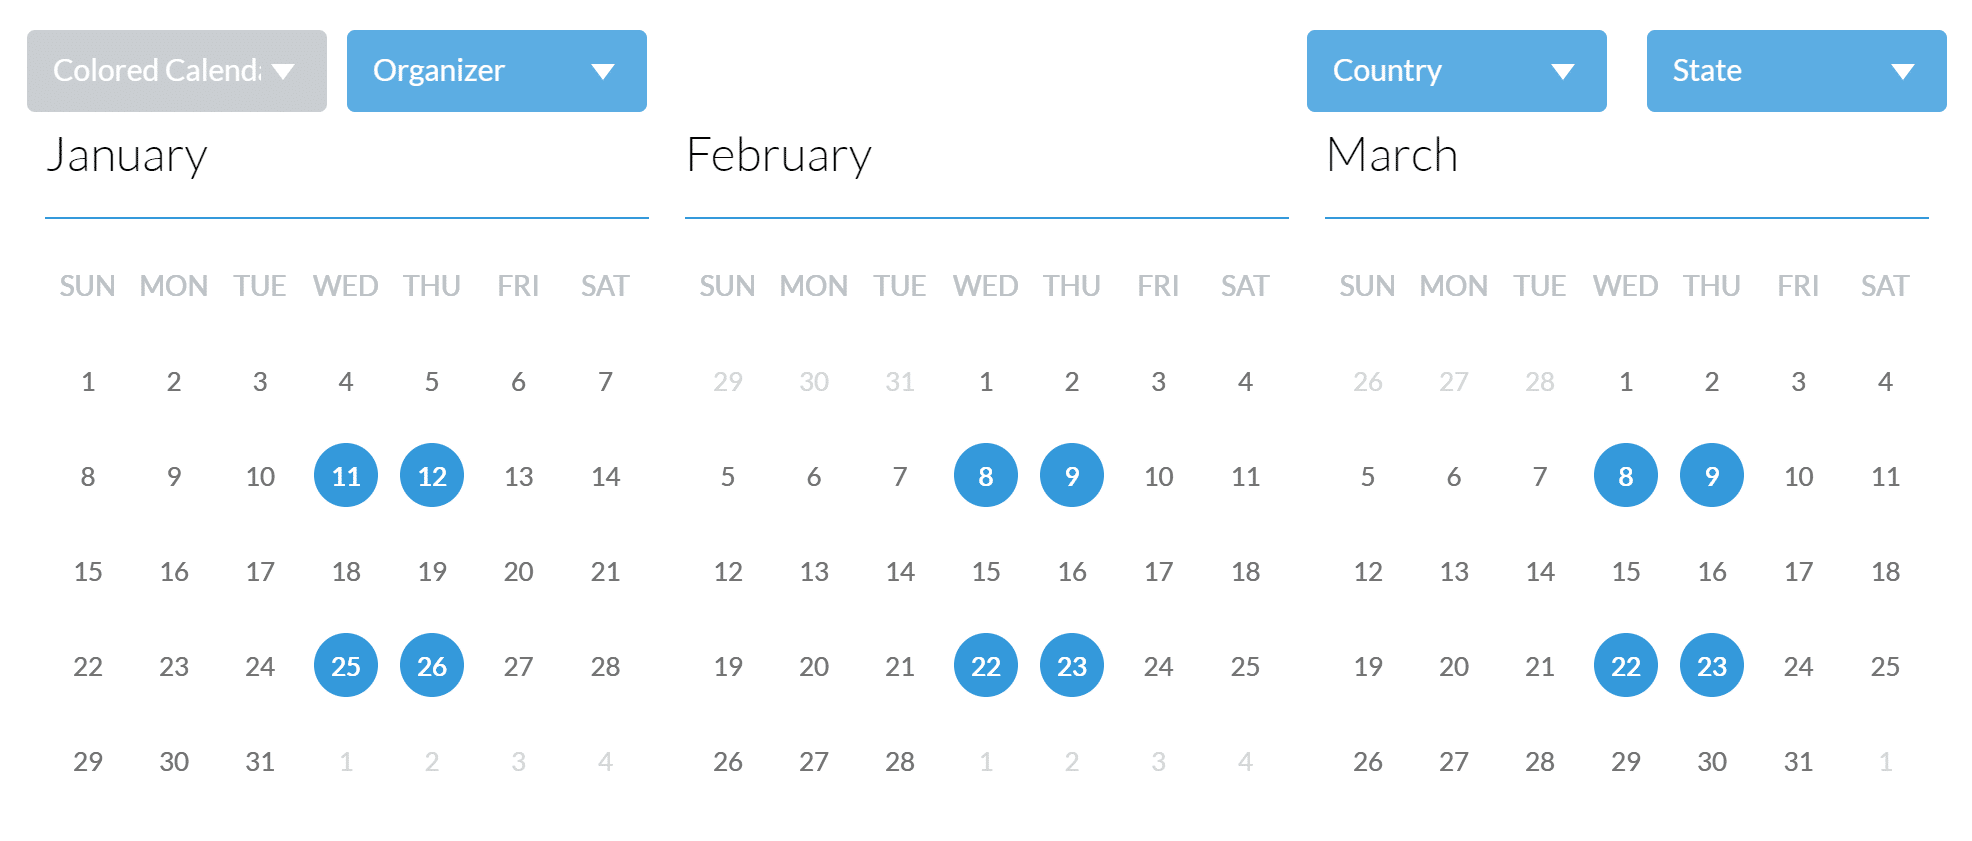 Calendar Year View